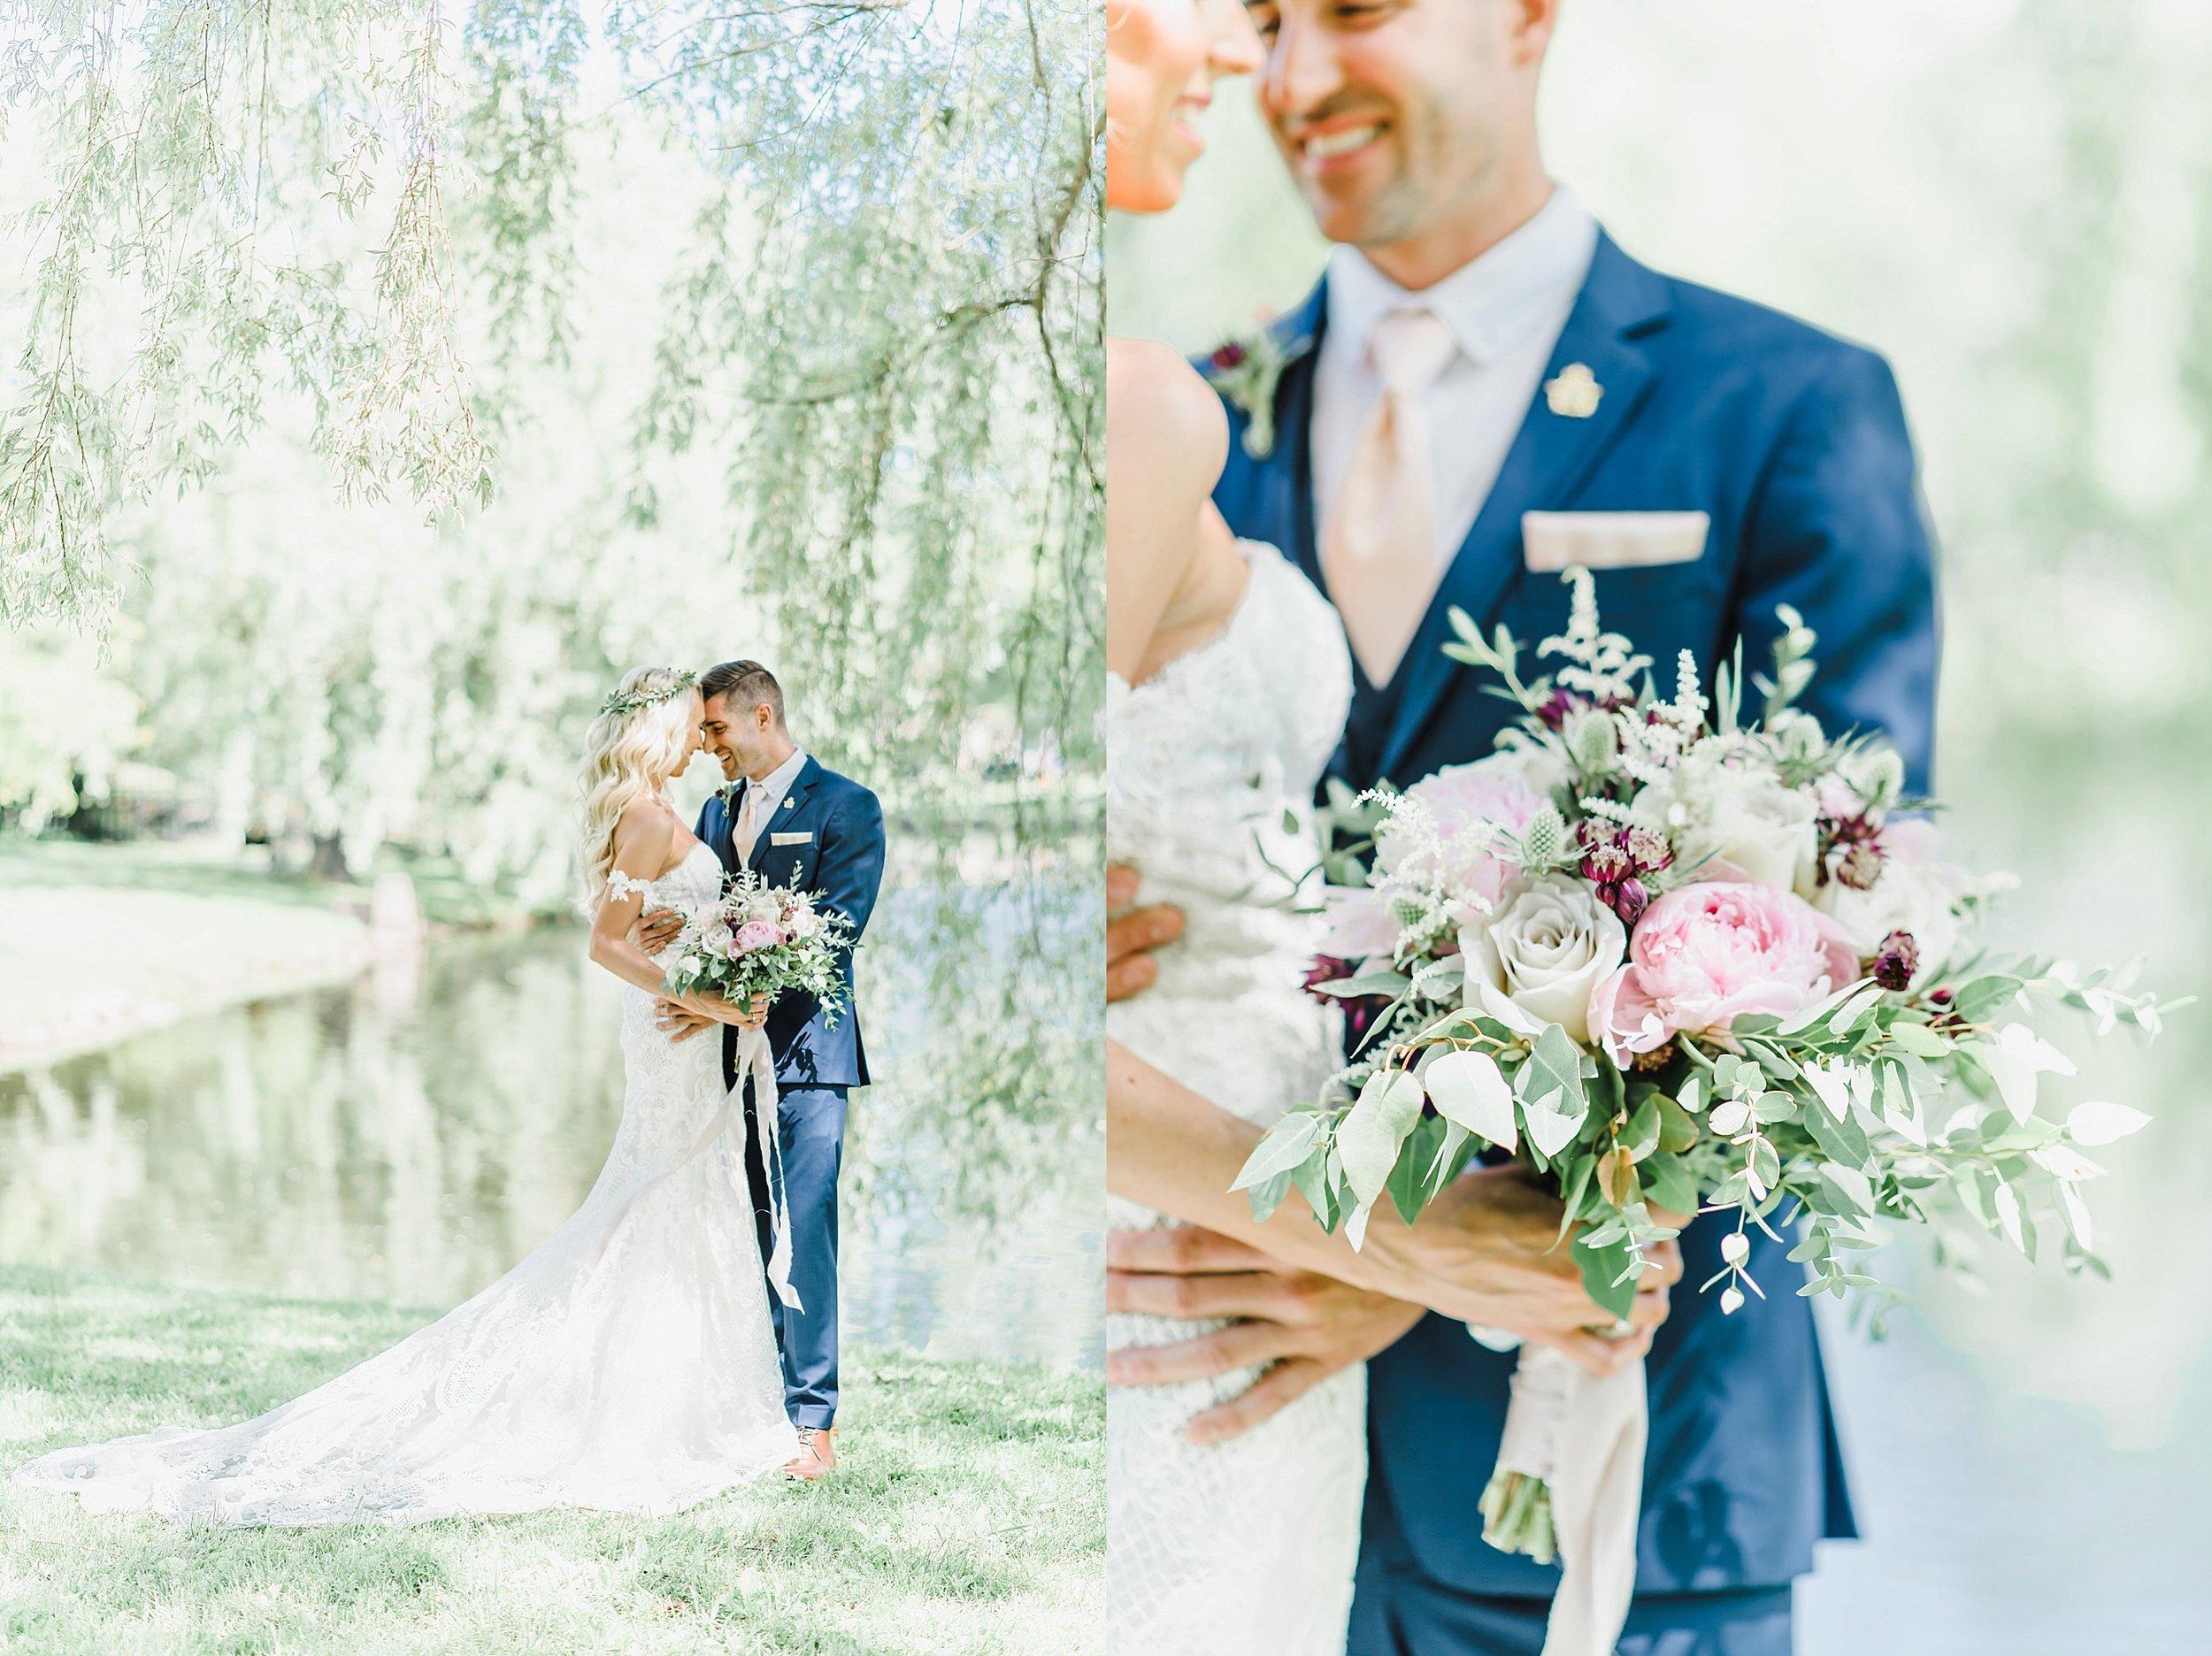 light airy indie fine art ottawa wedding photographer | Ali and Batoul Photography_0034.jpg